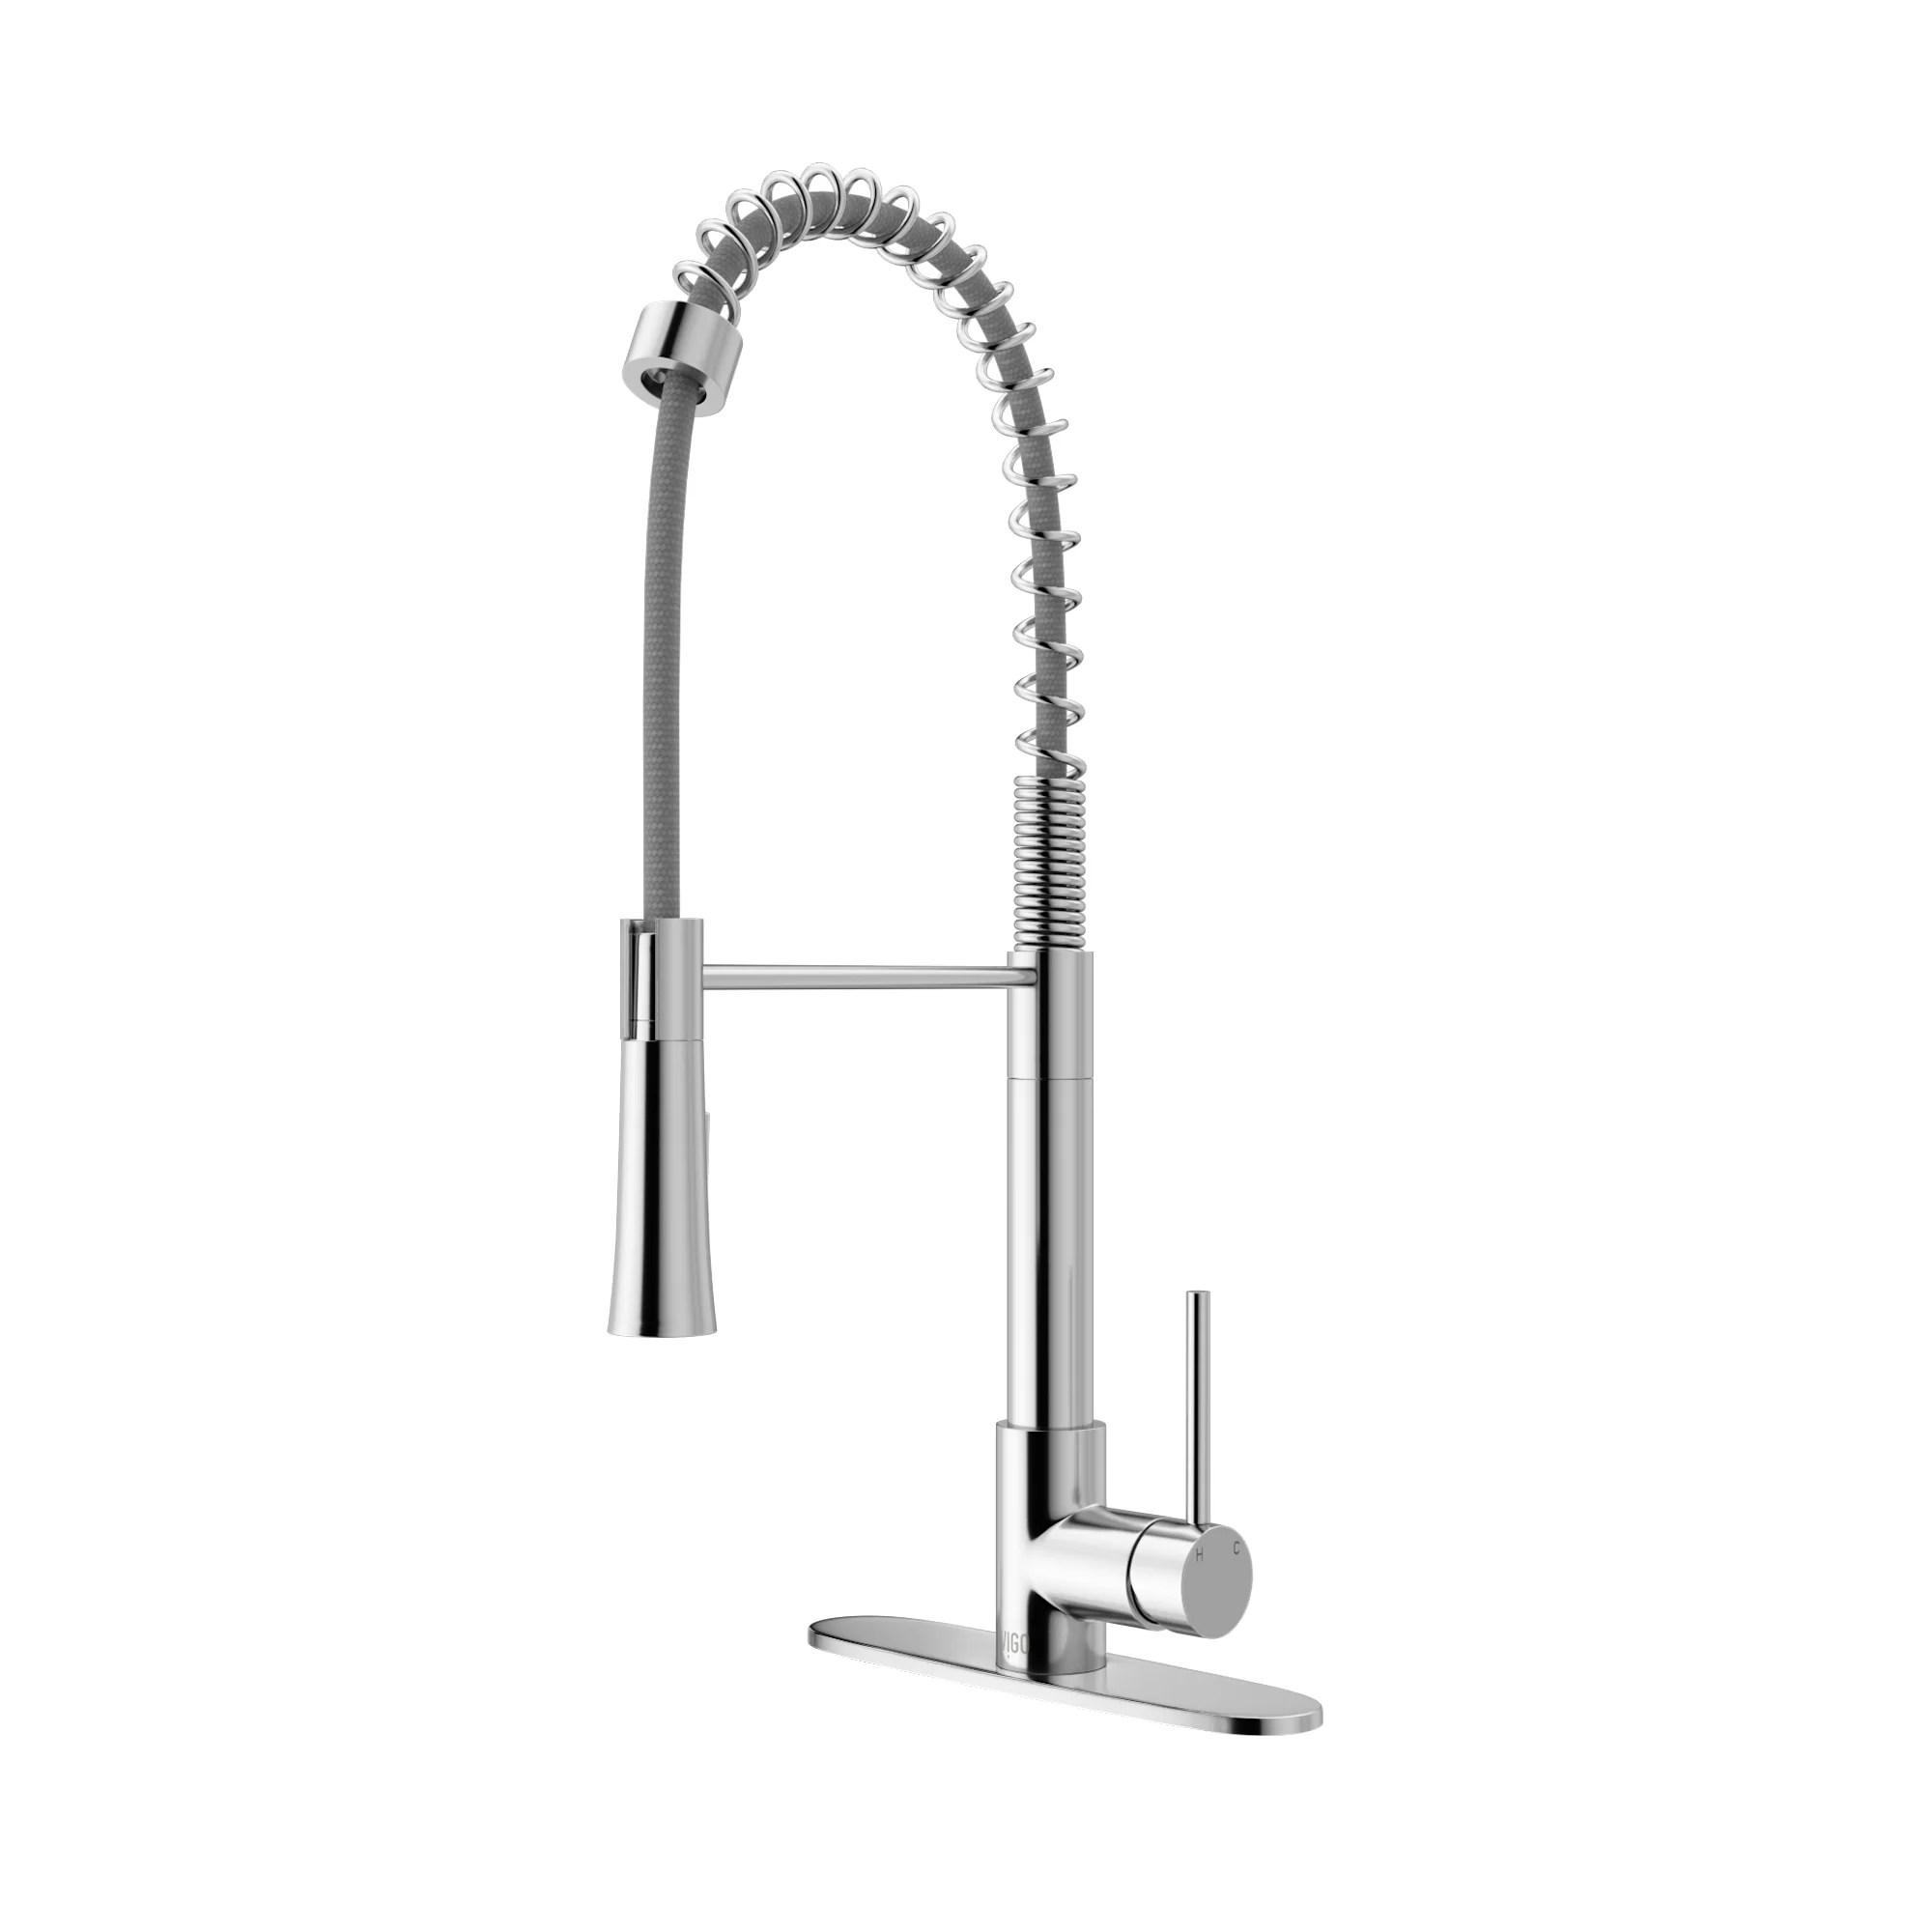 single kitchen faucet black mat rugs vigo laurelton pull down handle reviews vg02022chk1